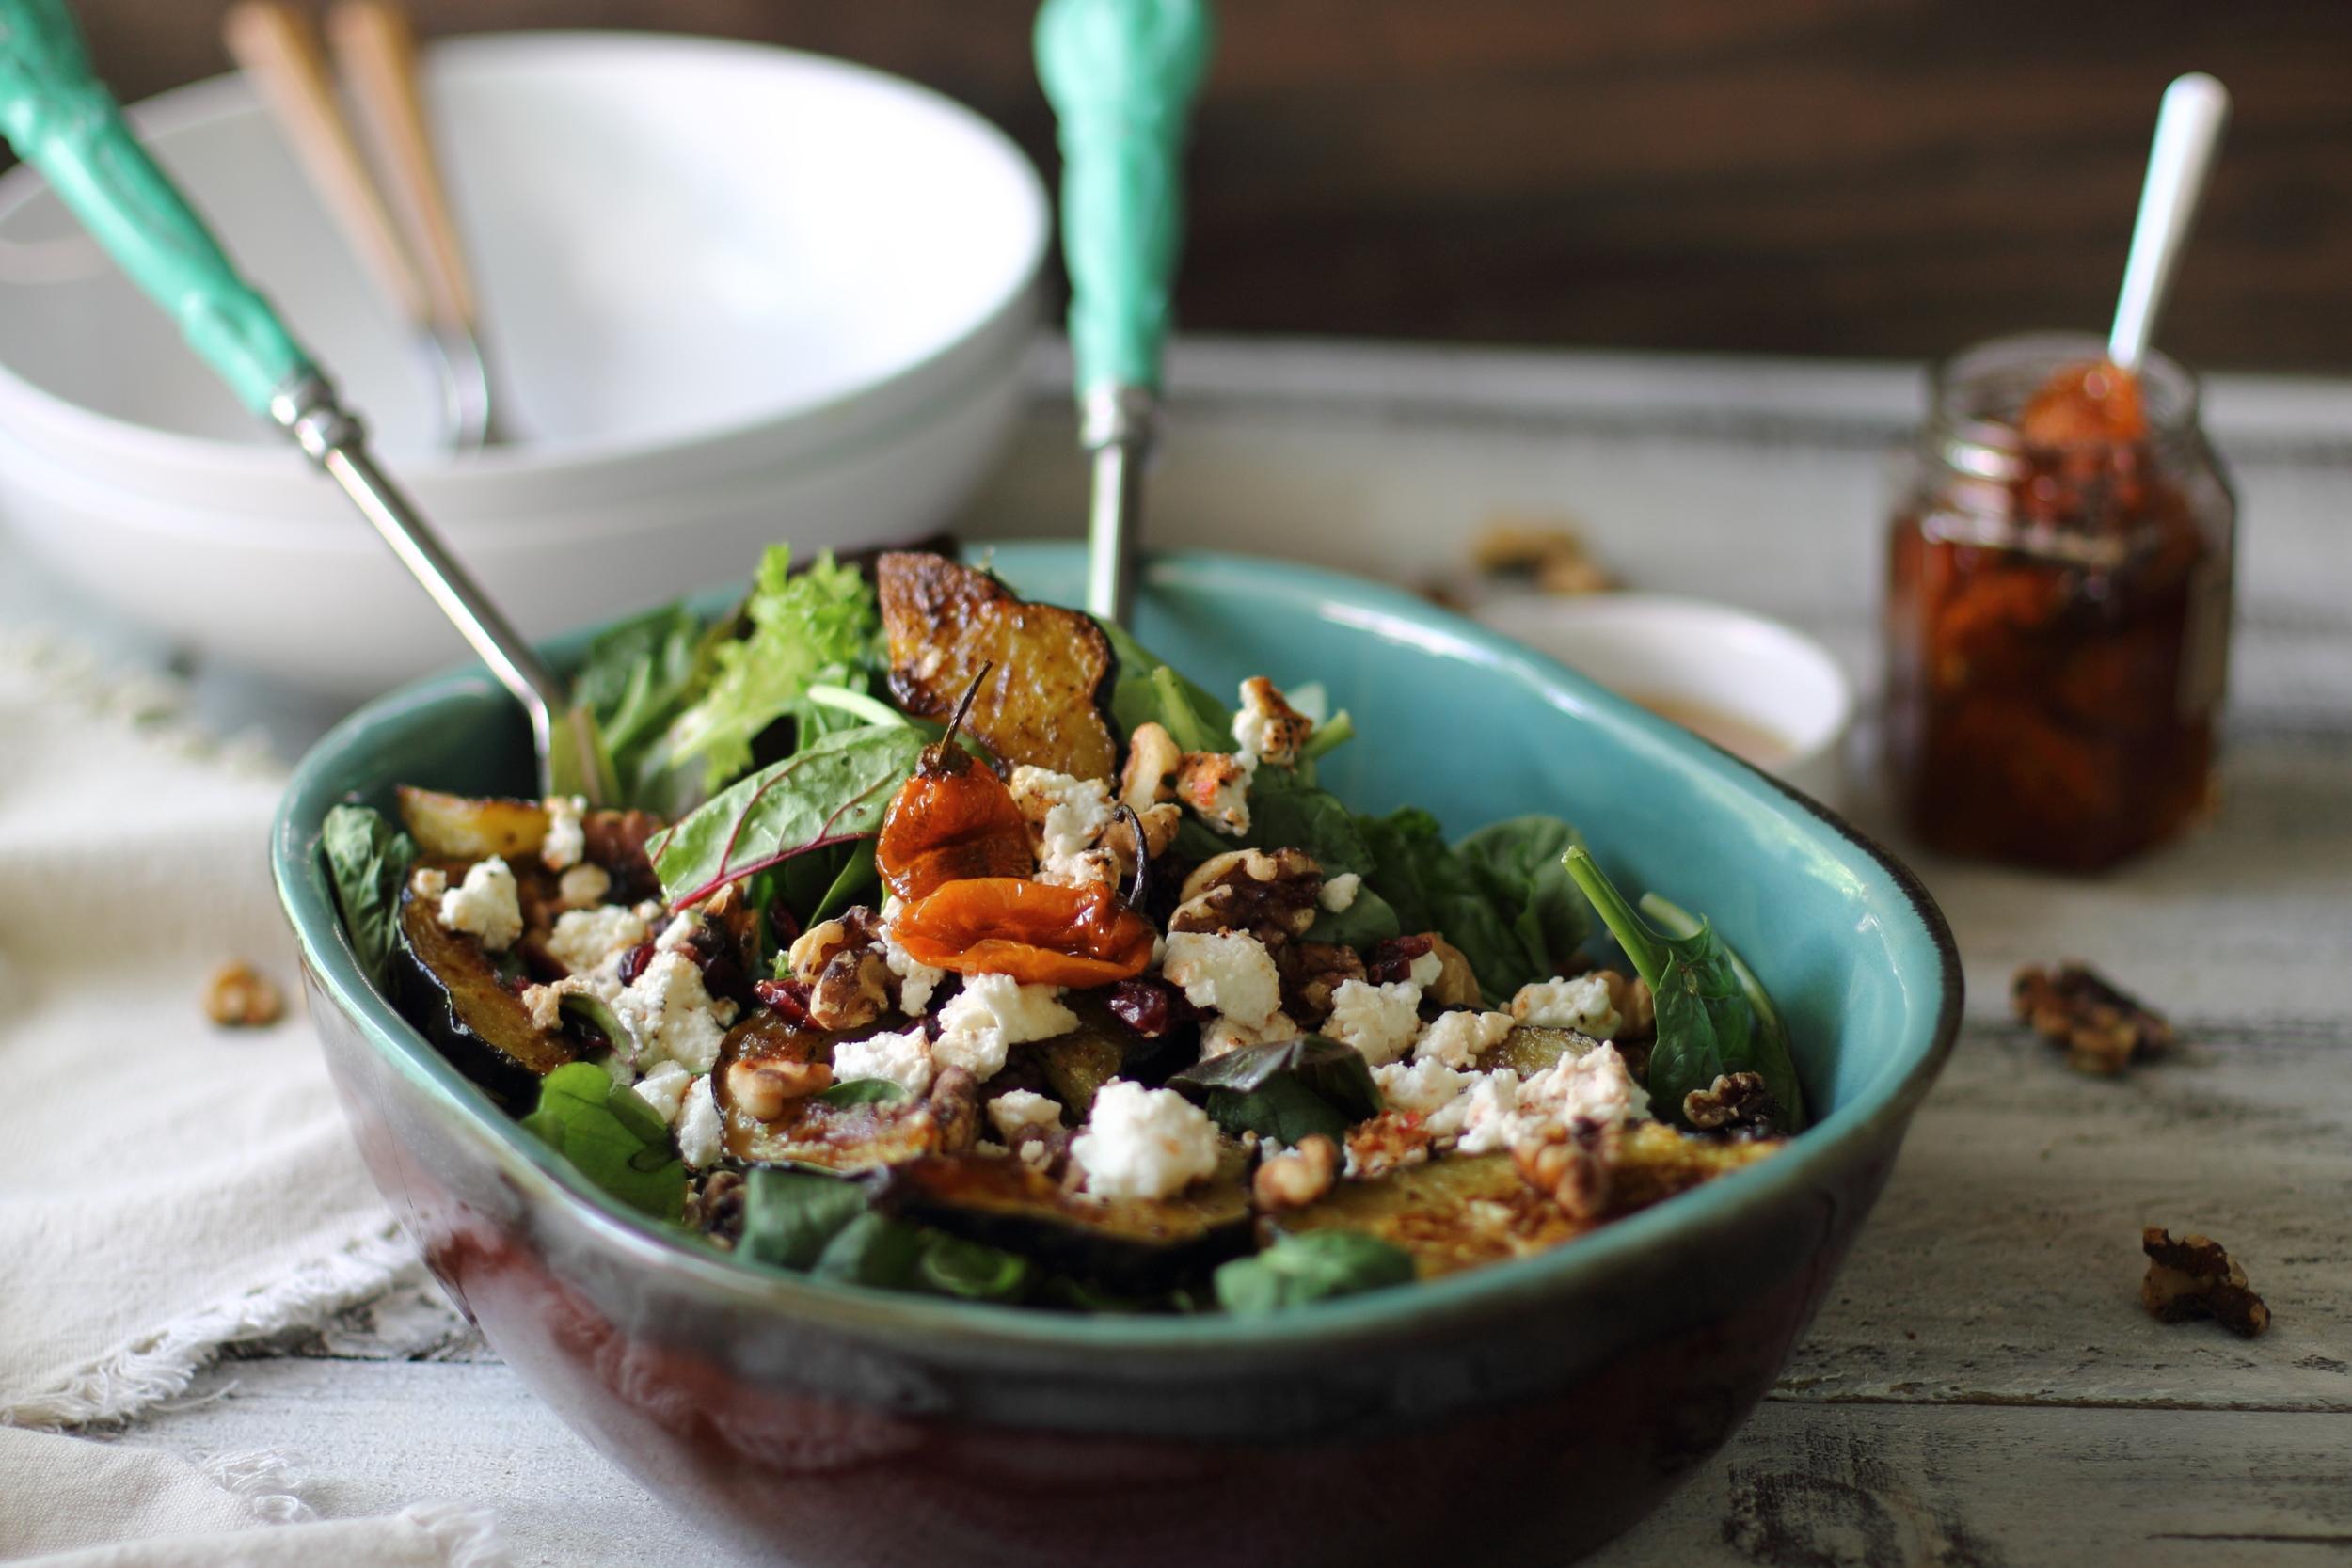 Spicy Honey Roasted Acorn Squash Salad: My Diary of Us